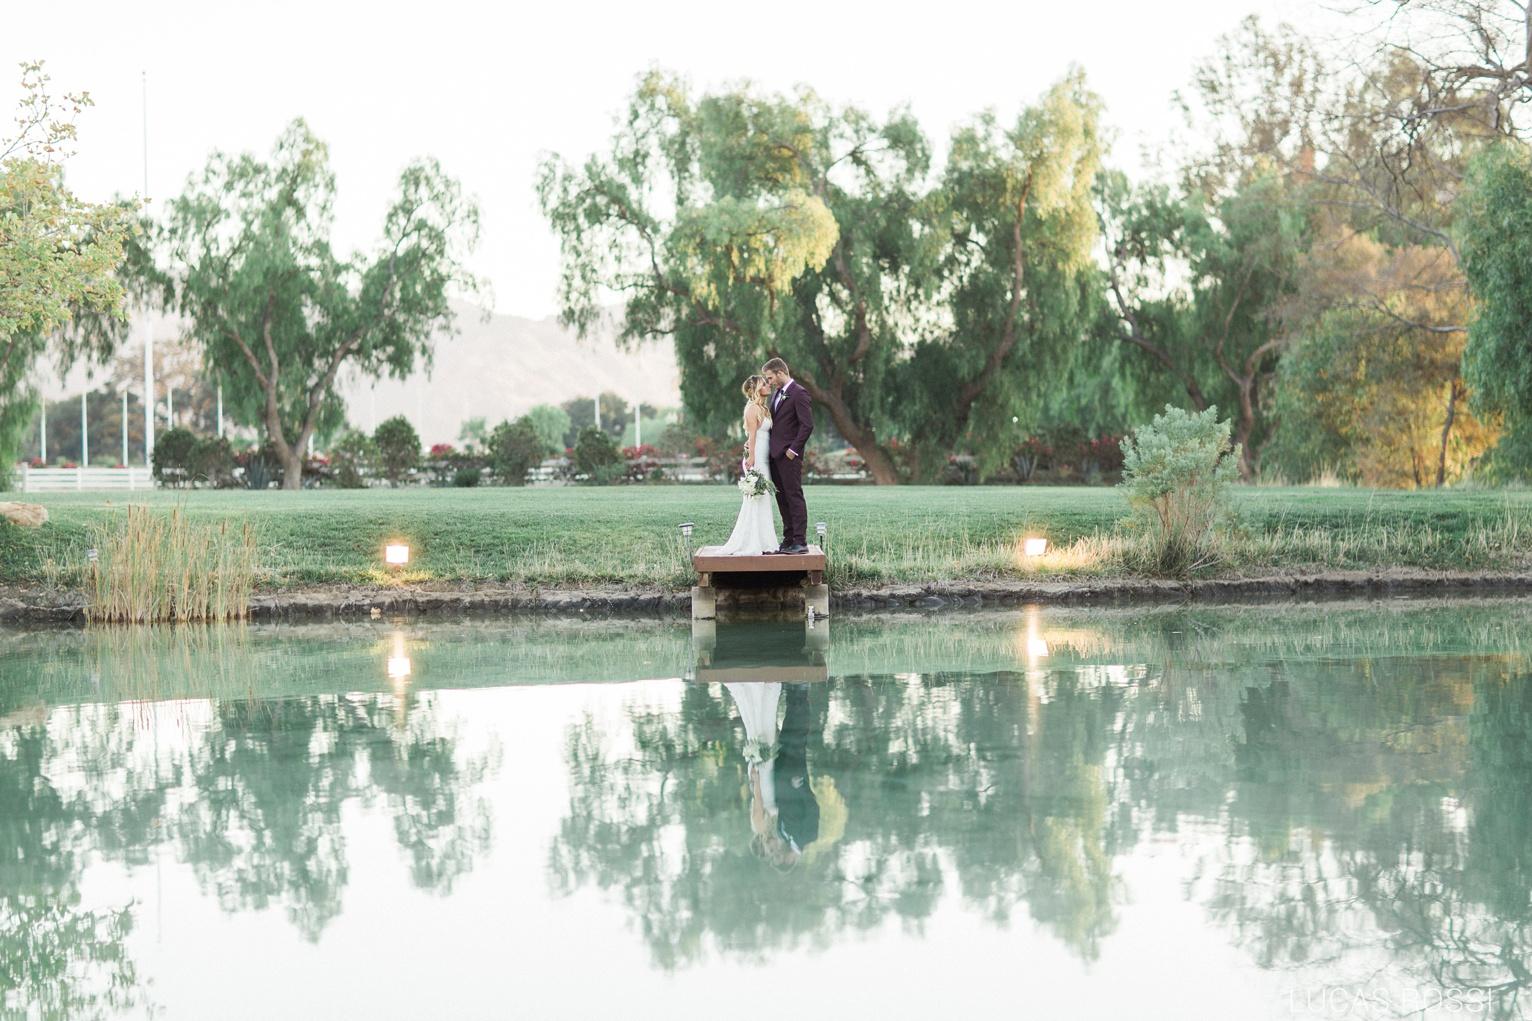 Hummindbird-Nest-Ranch-Wedding-Carly-Daniel-405